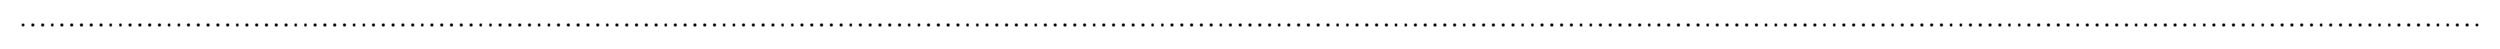 Dot Line 01-01.png